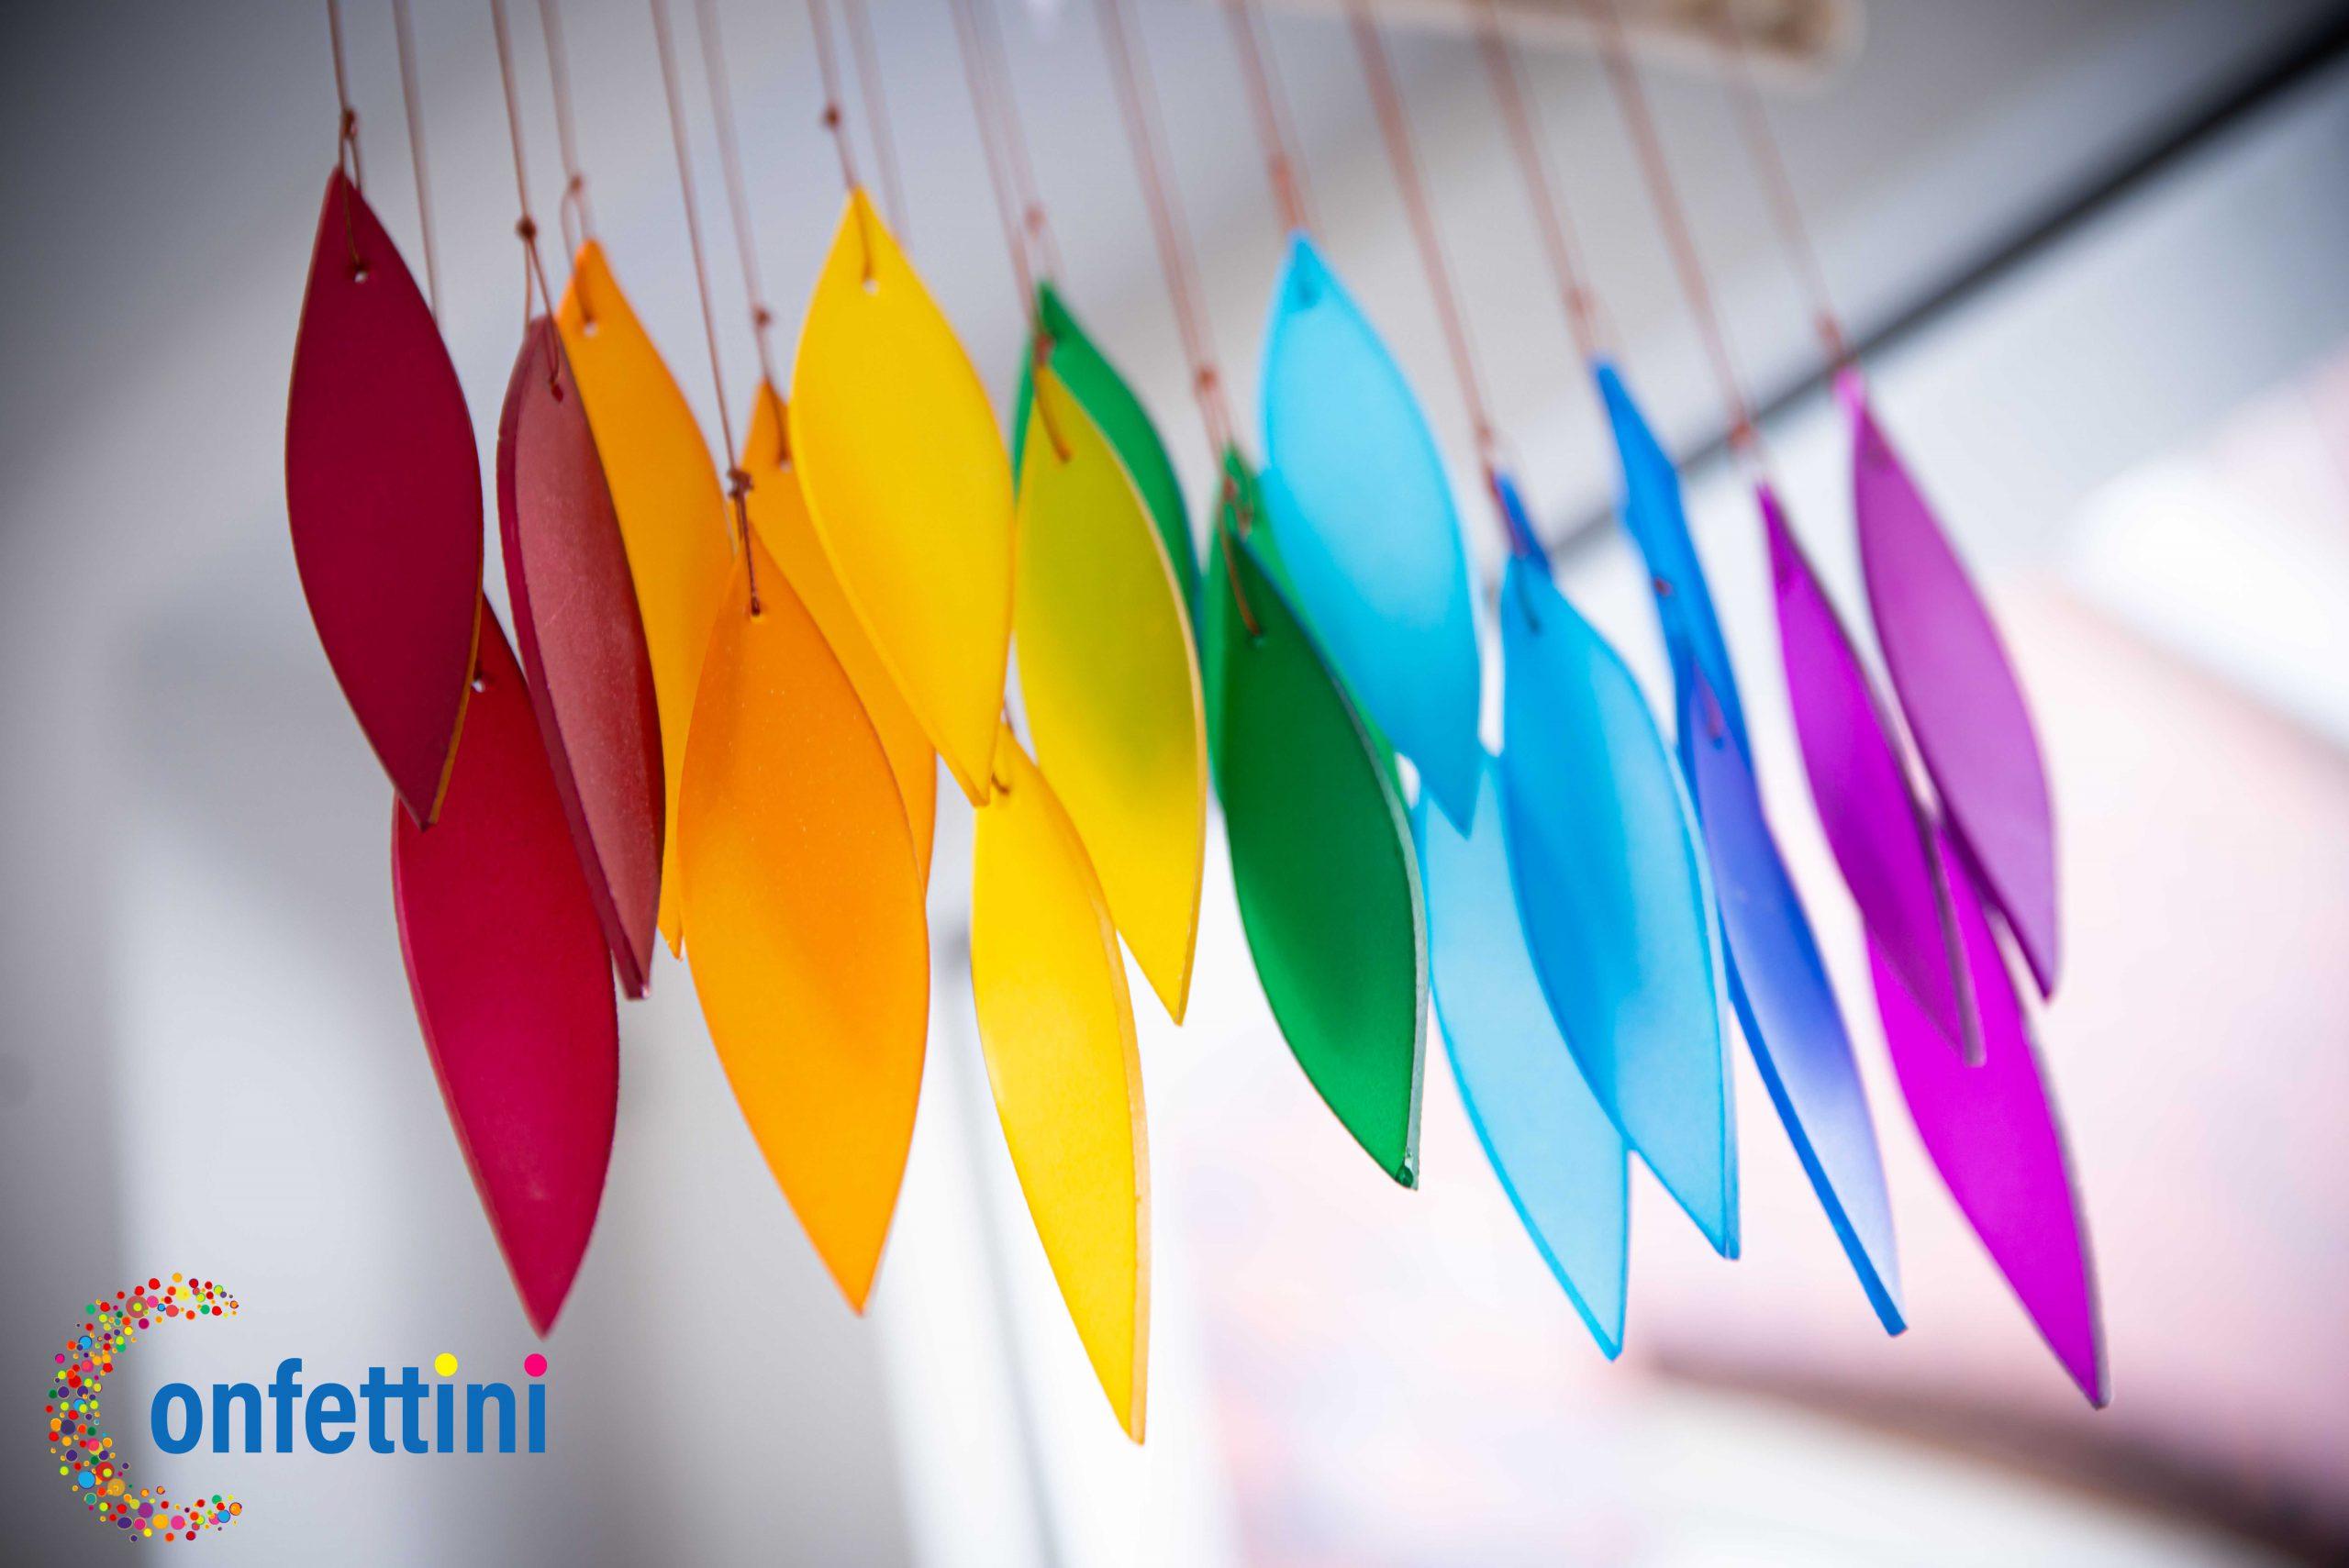 confettini großtagespflege düsseldorf - decorative